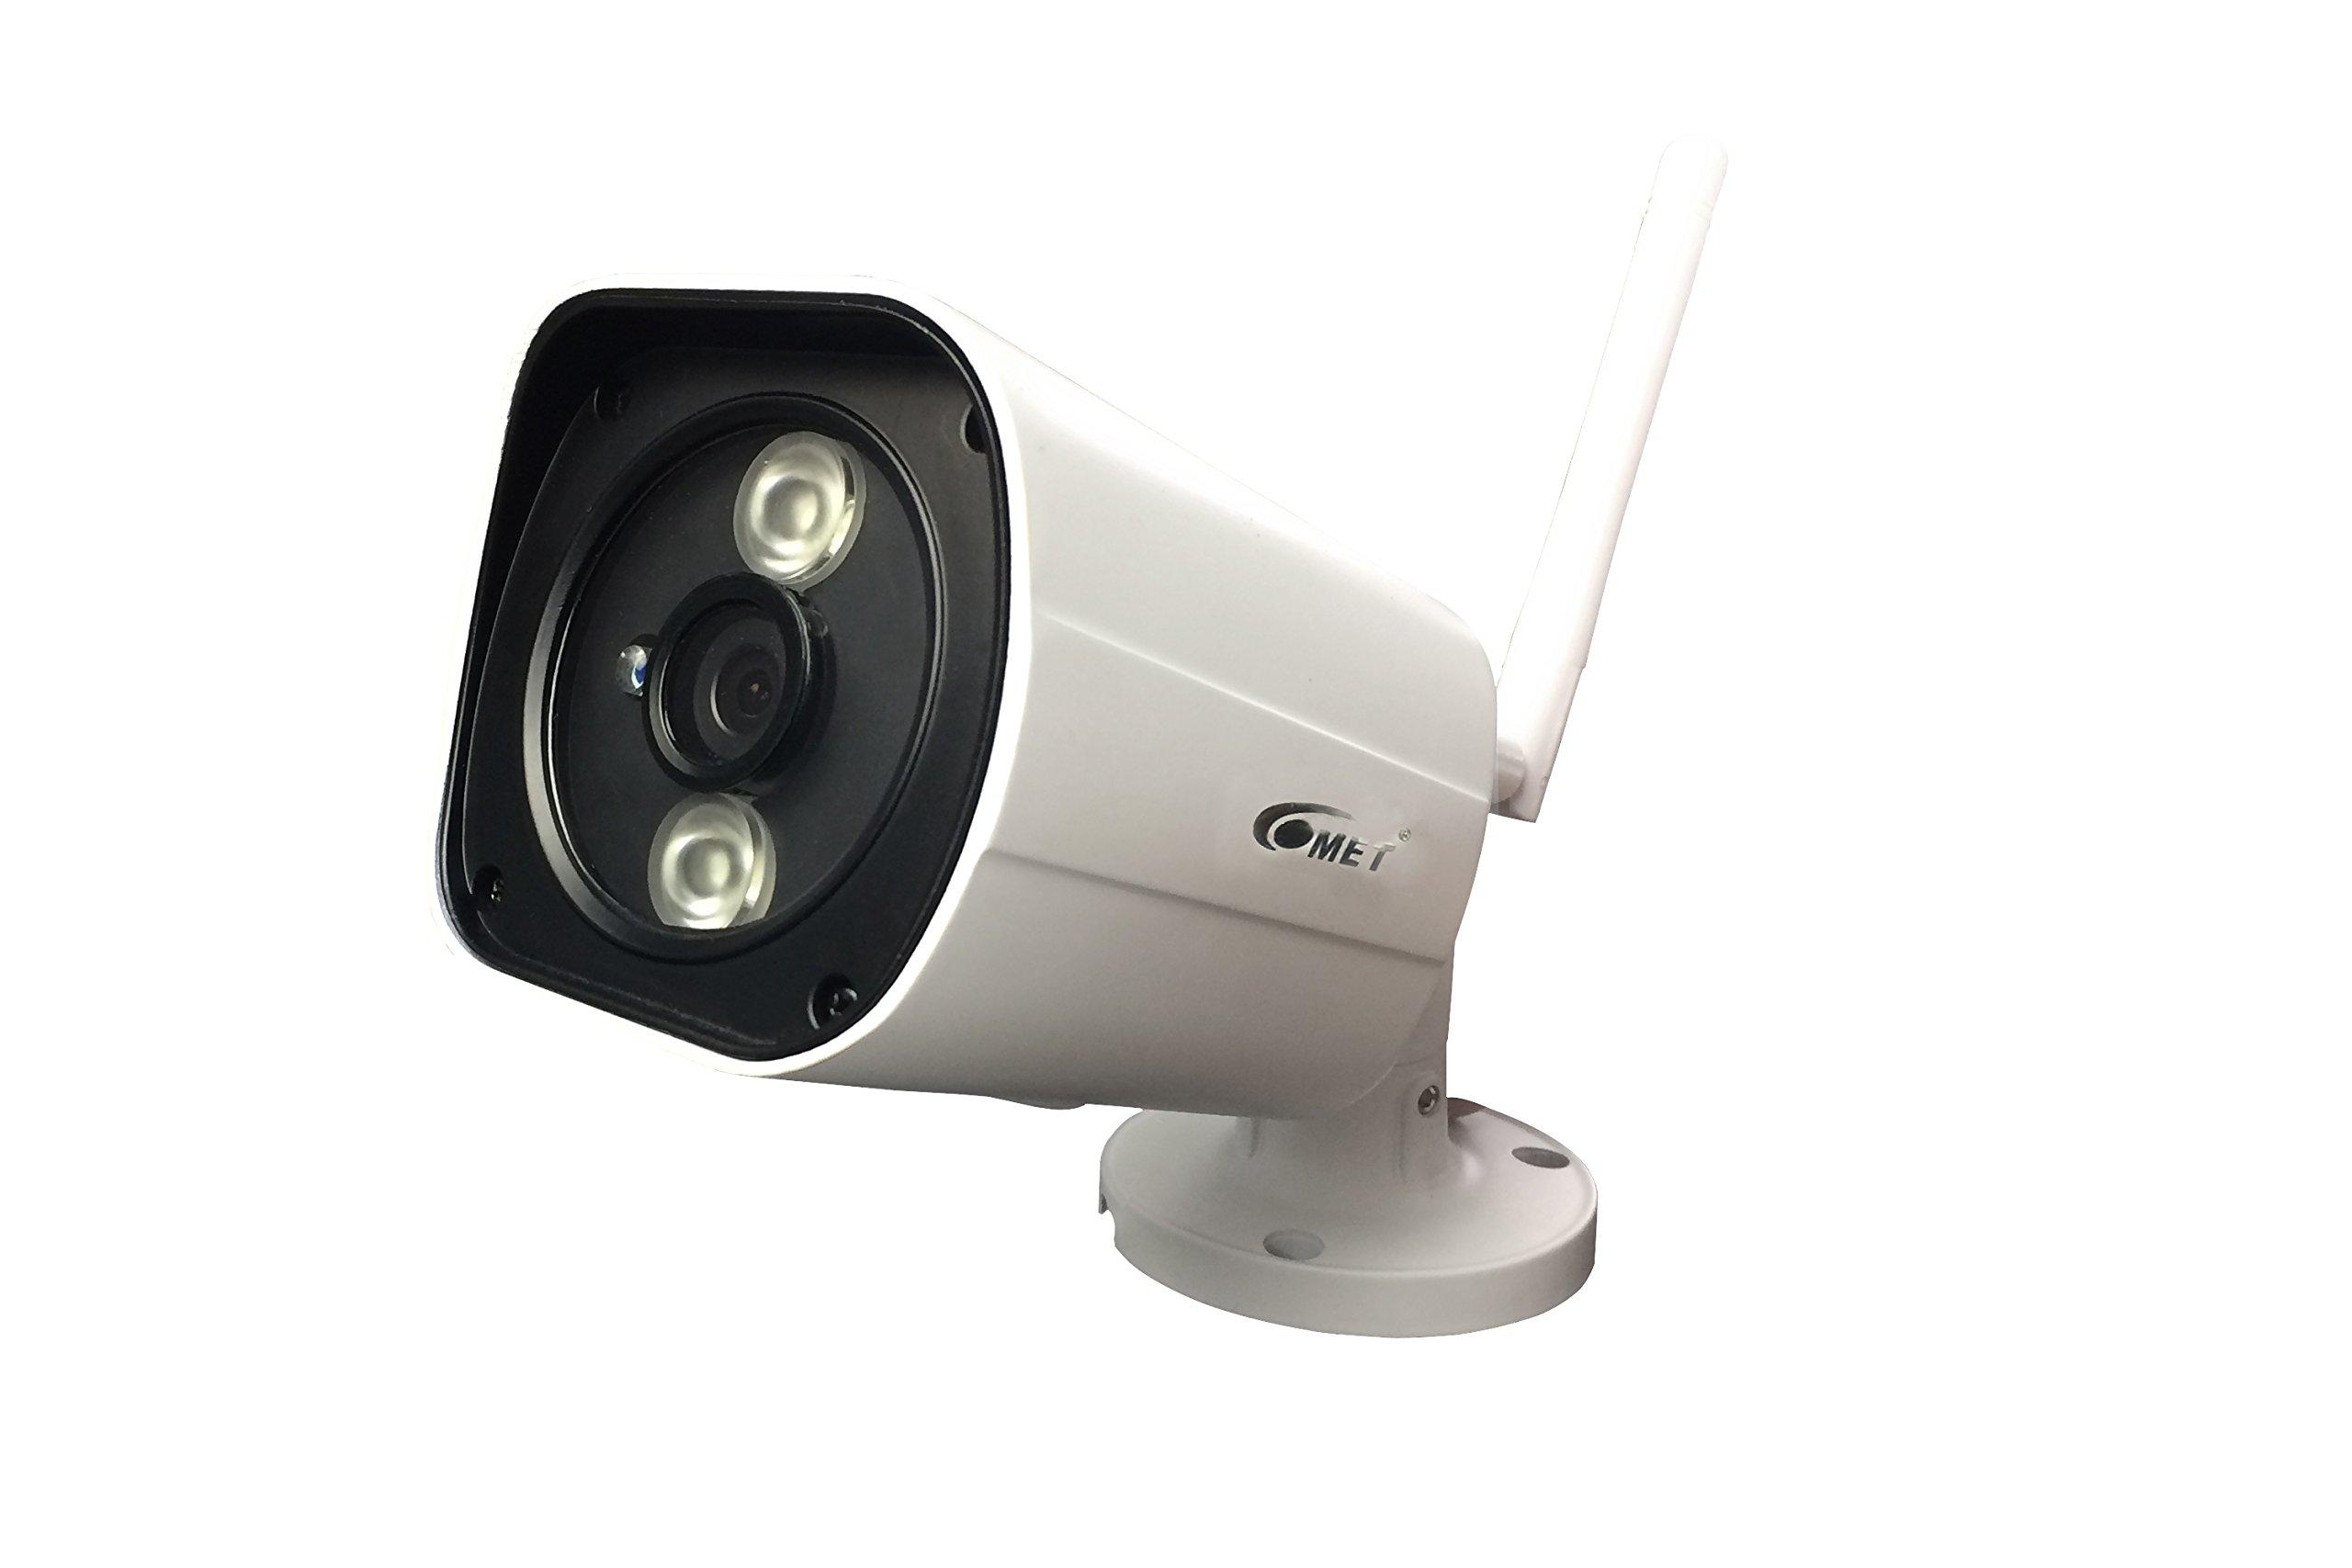 COMET Bullet Camera 1080P HD IP Camera WiFi IP Camera Surveillance Camera for Pet Baby Monitor Indoor/Outdoor Camera